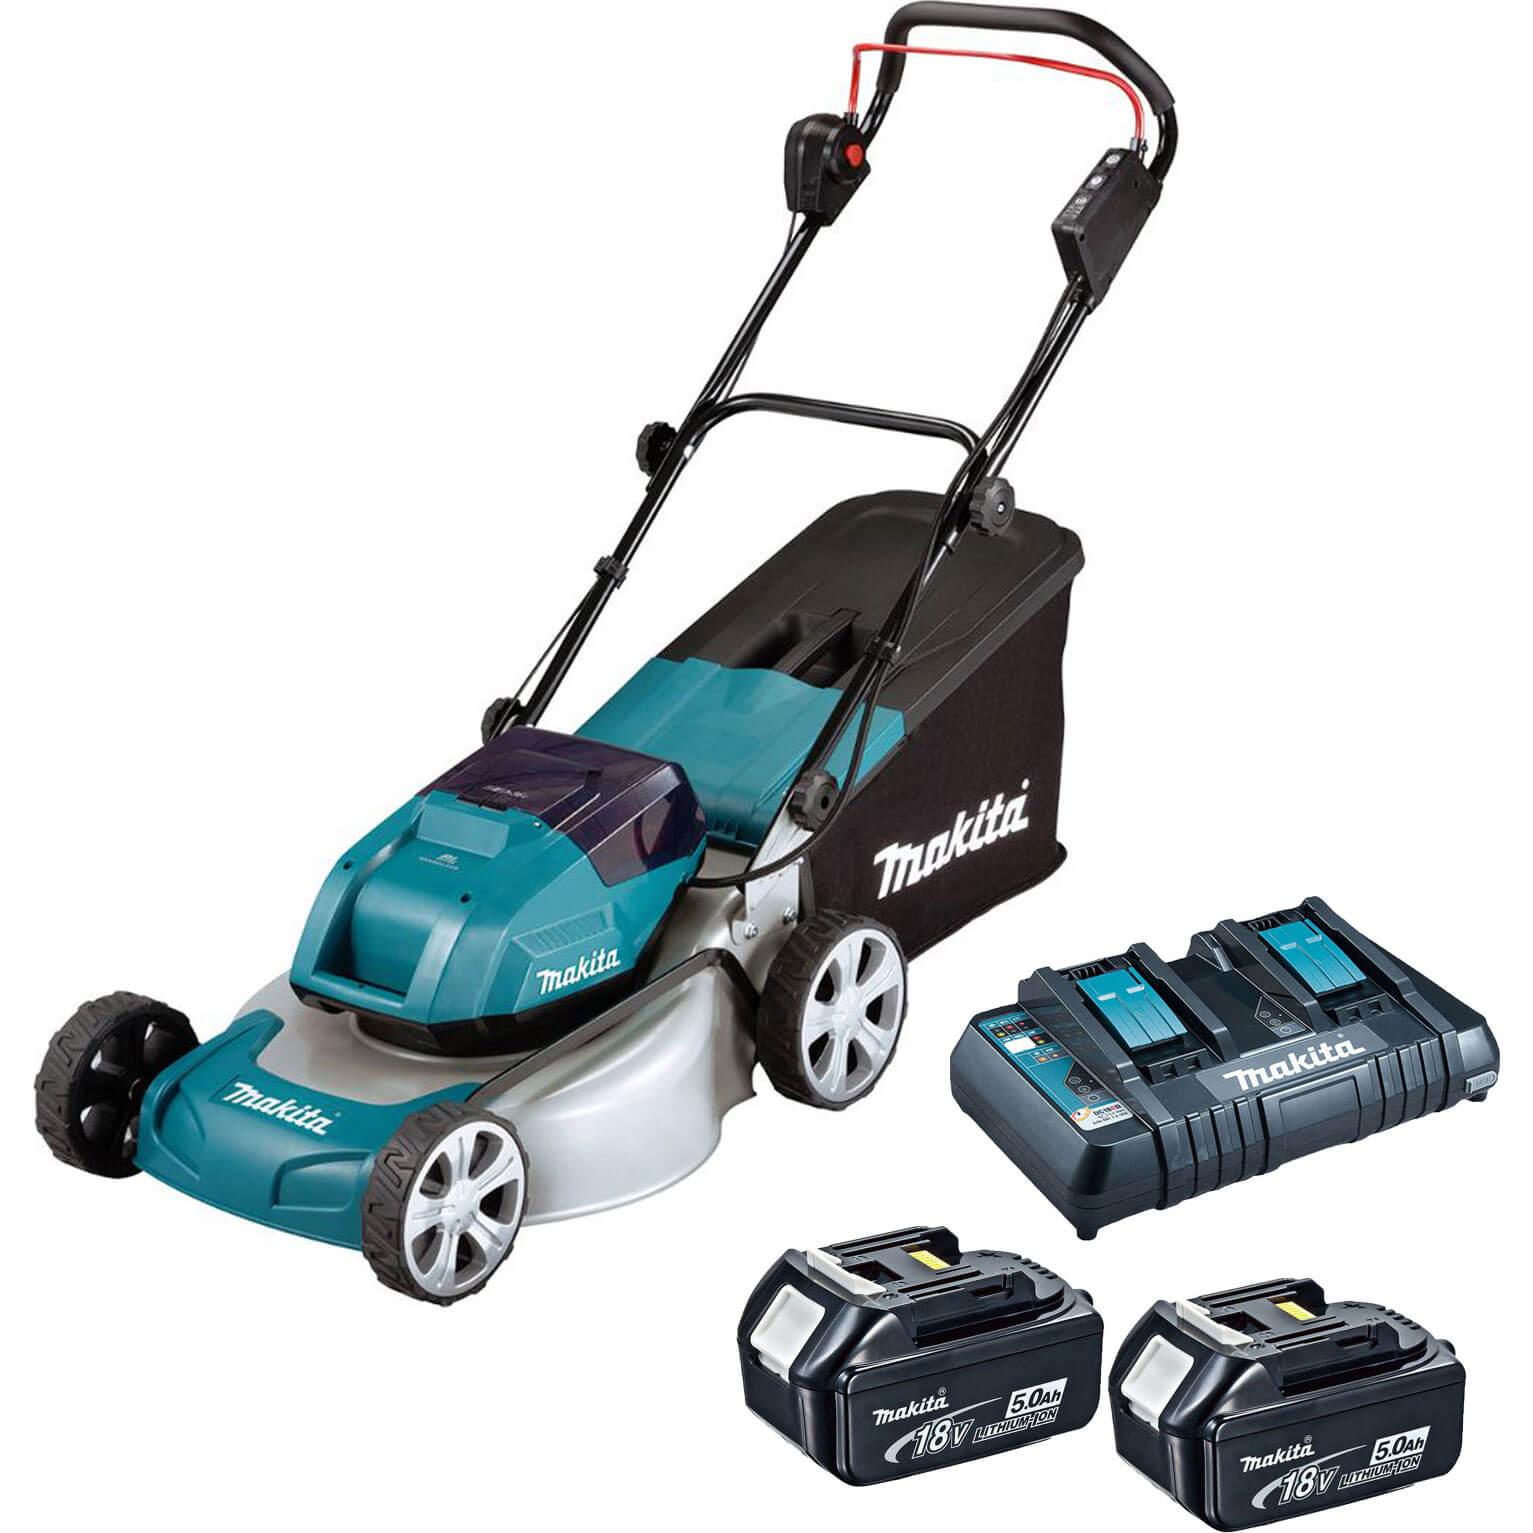 Makita DLM460 Twin 18v LXT Cordless Brushless Rotary Lawn Mower 460mm 2 x 6ah Li-ion Charger